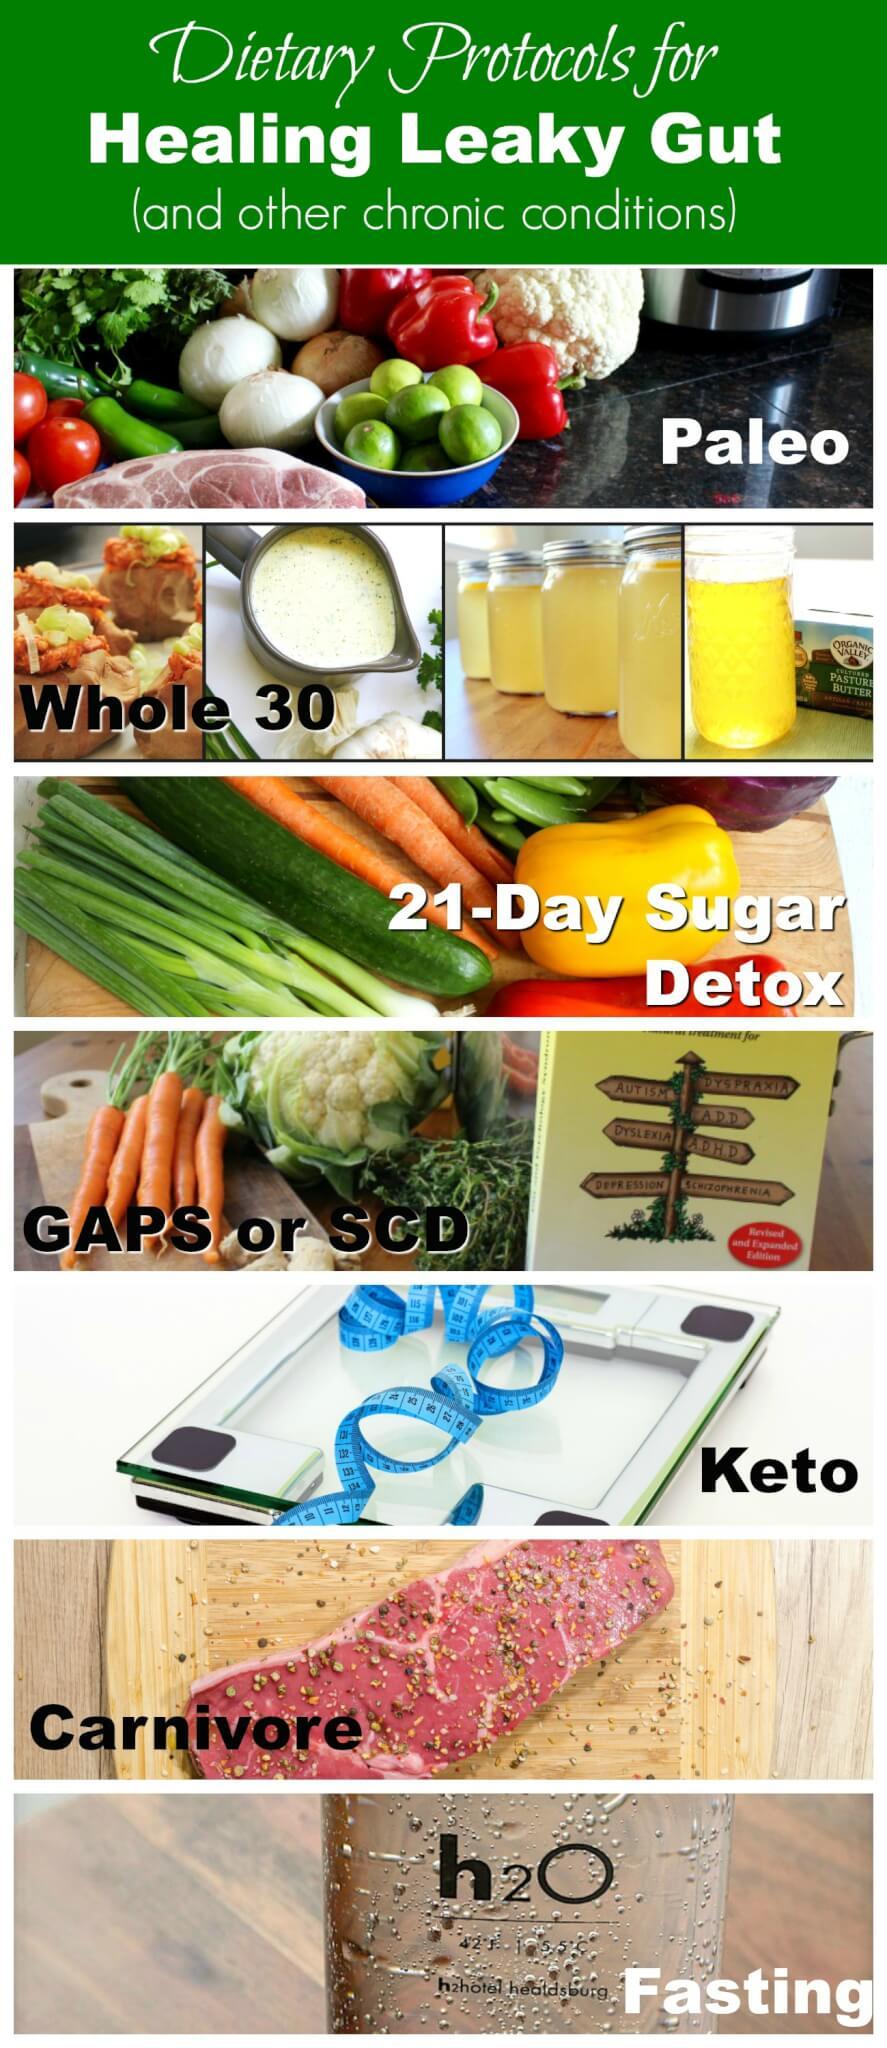 Leaky Gut Treatment through dietary protocols: 6 Healing